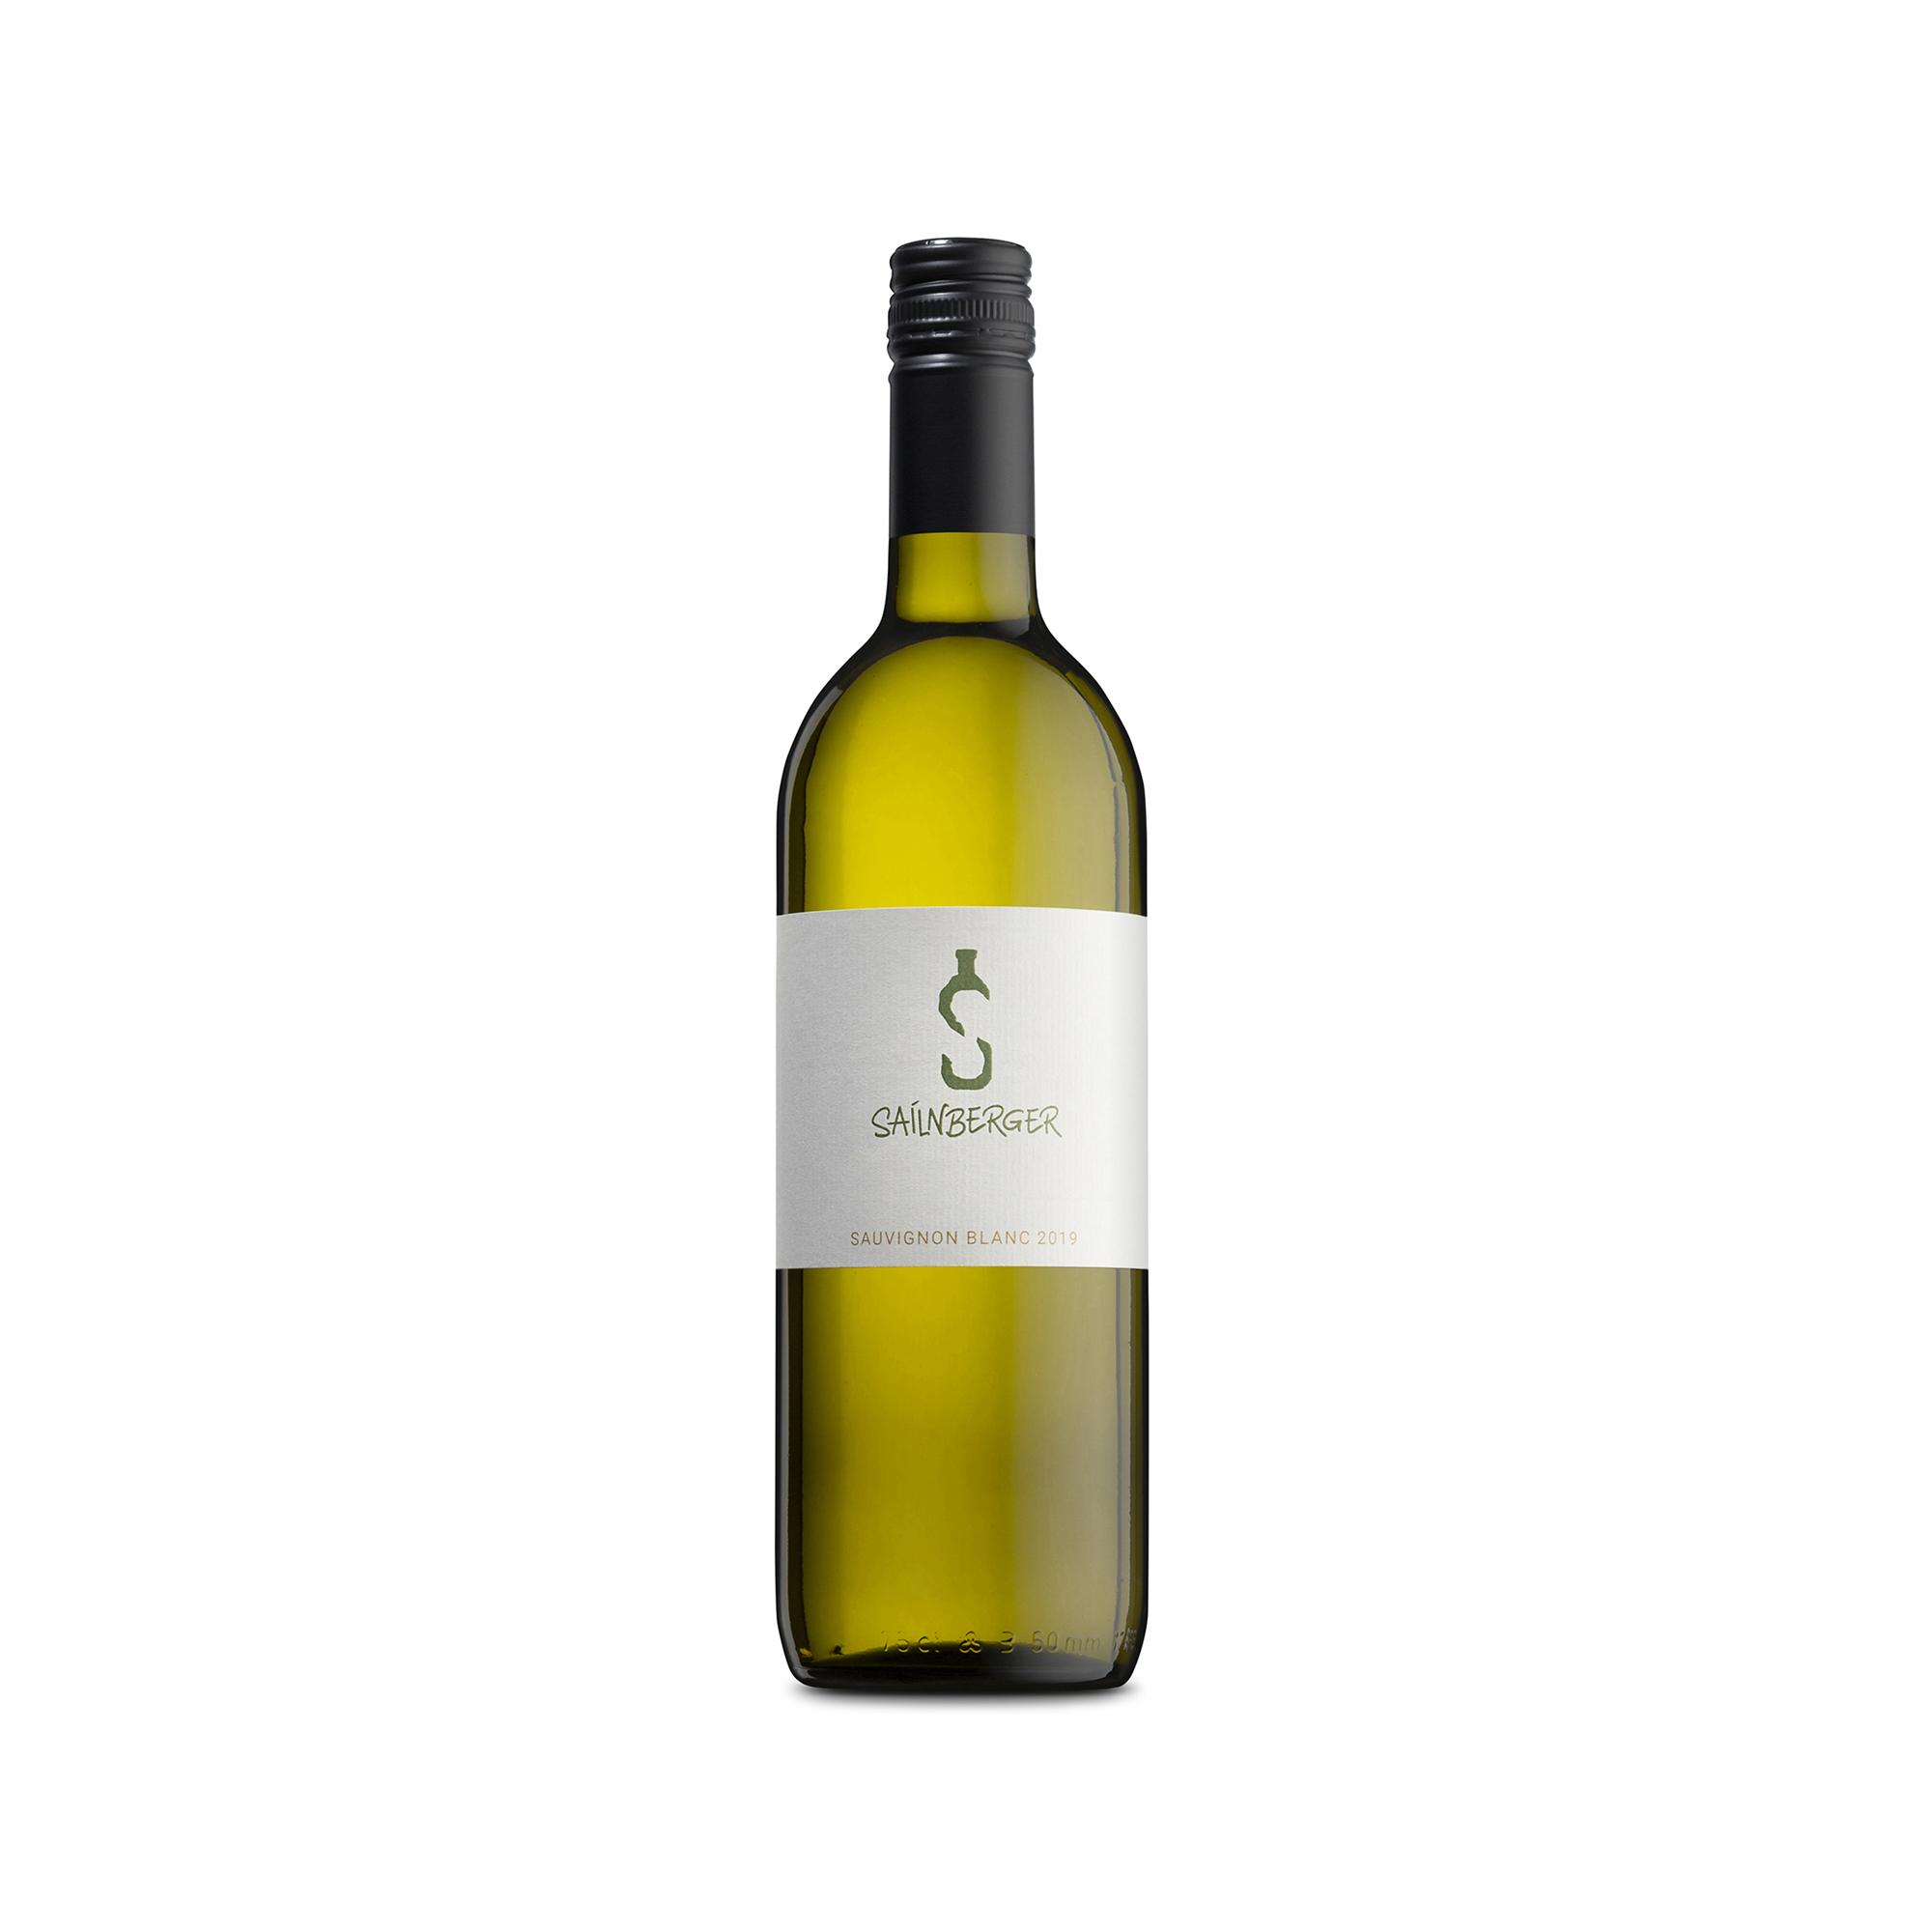 Sailnberger - Weinflasche Produktfotografie